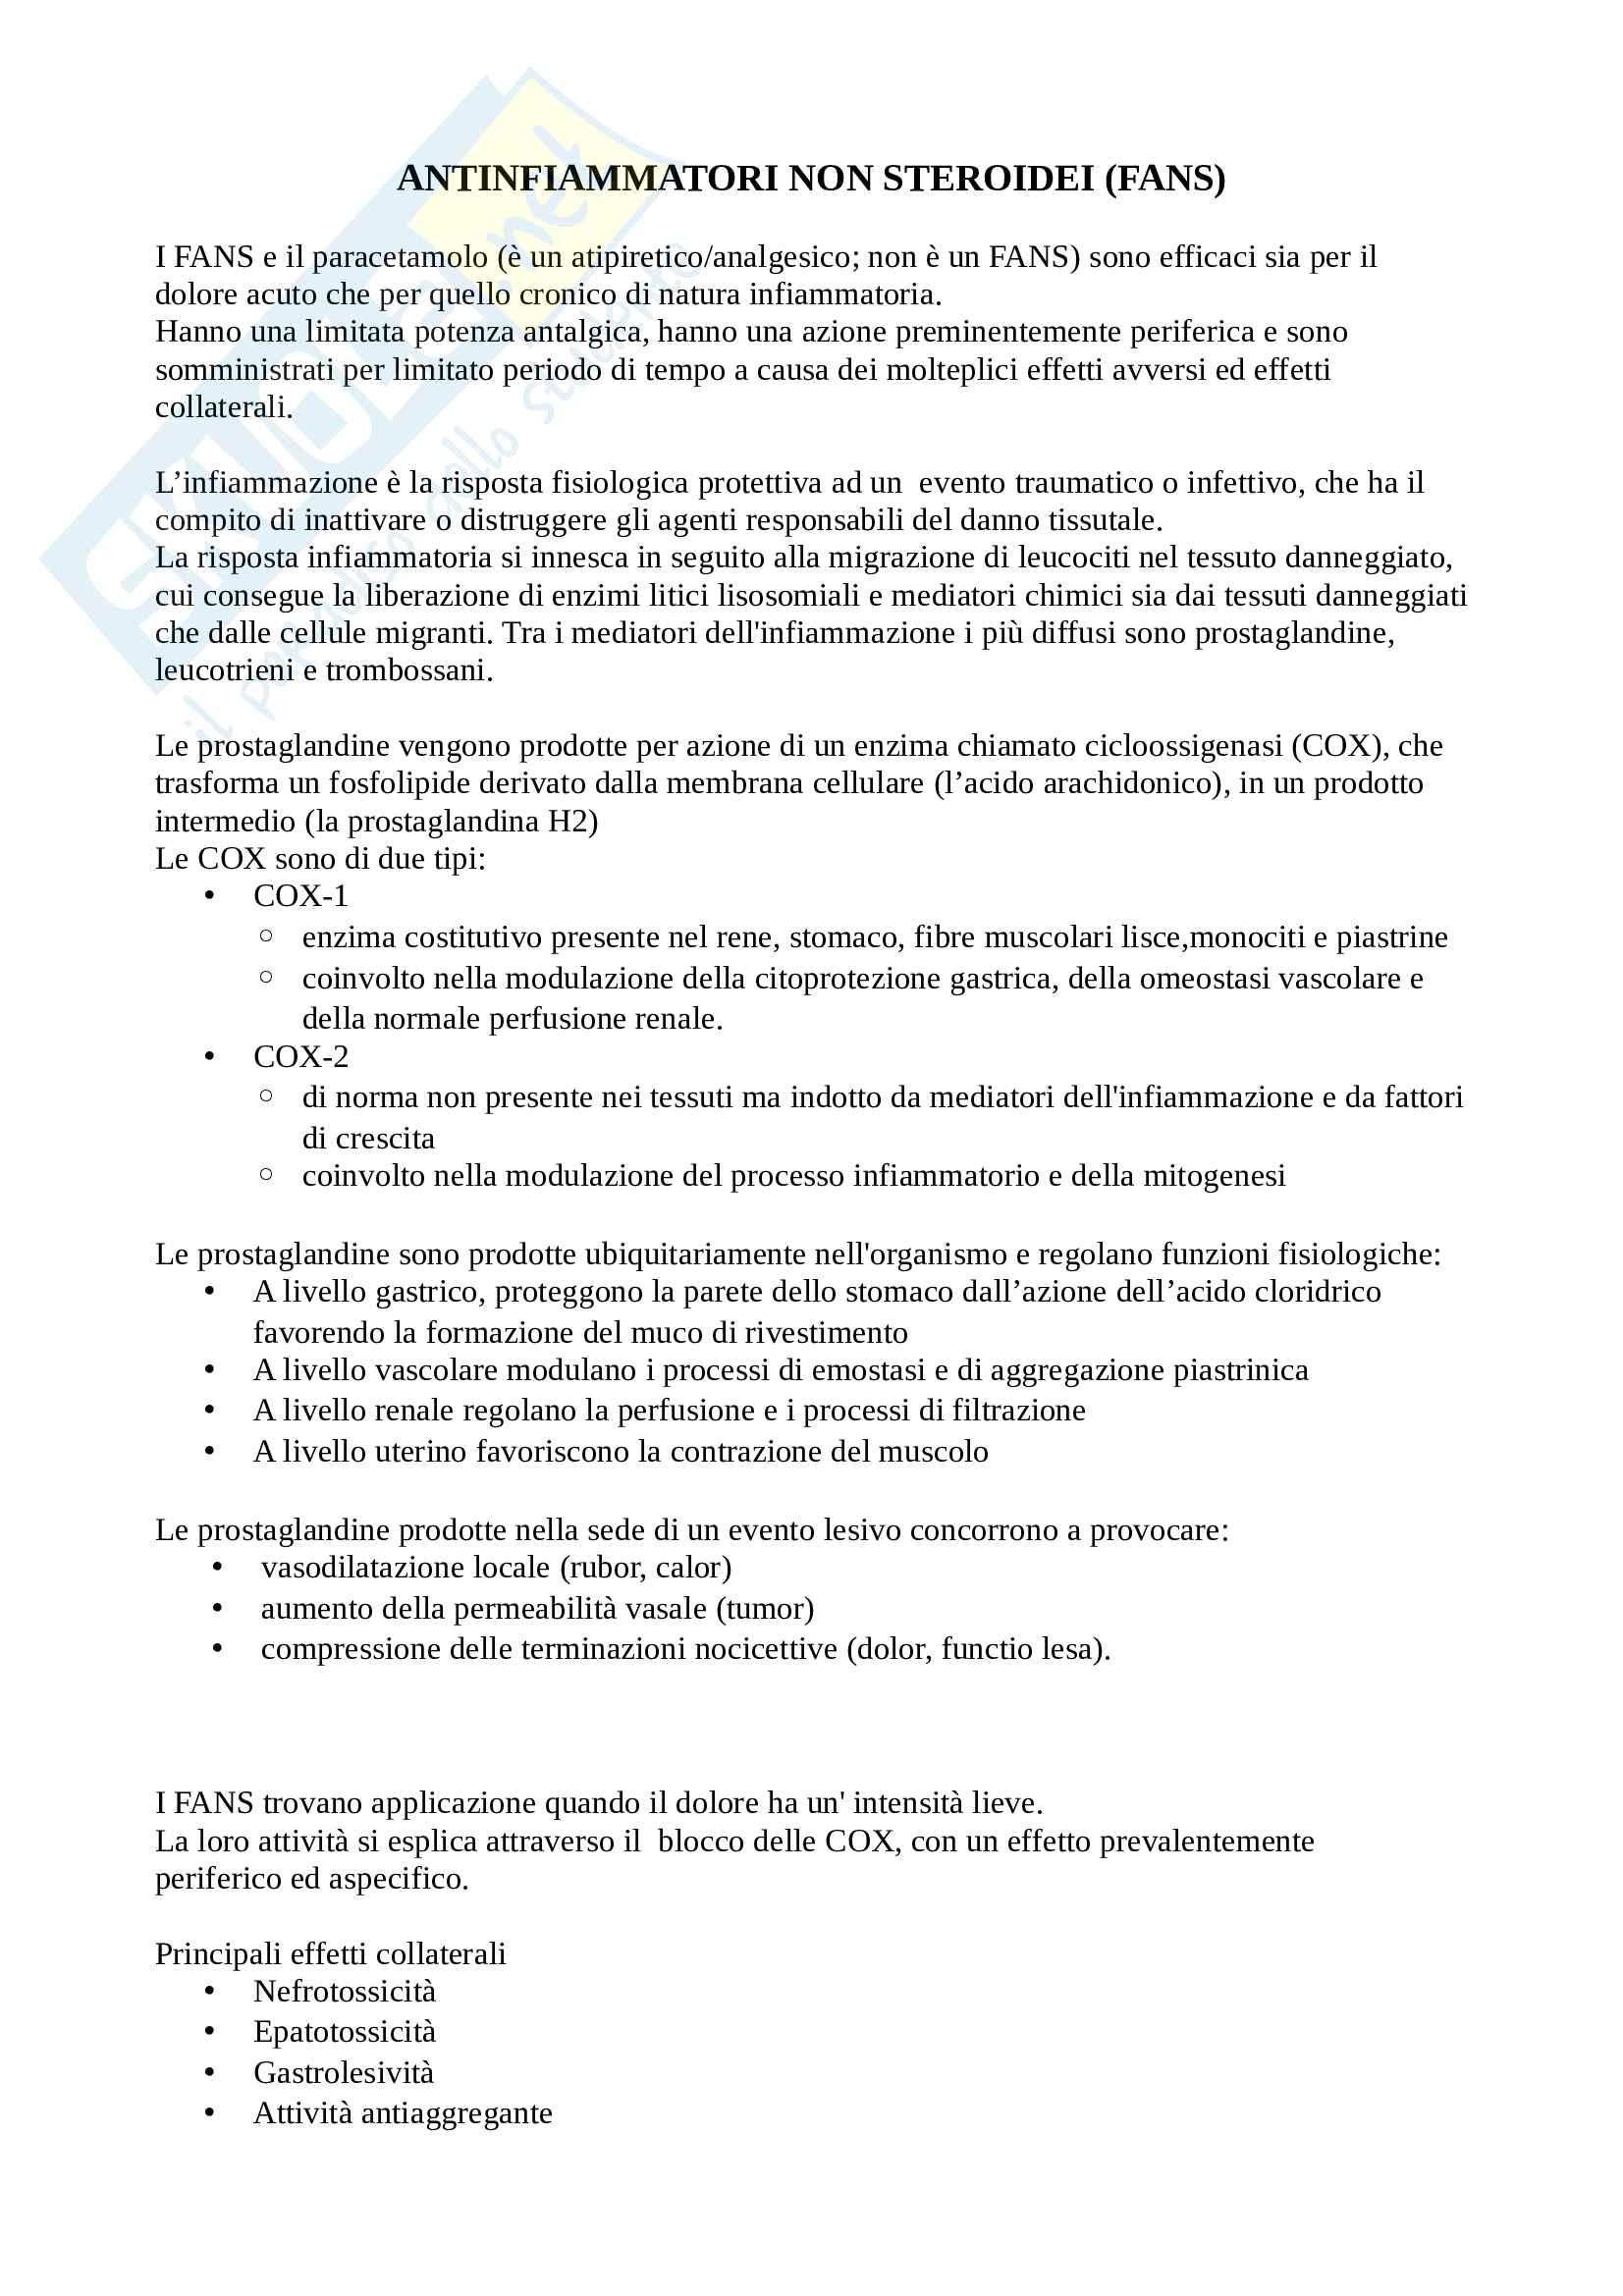 Antinfiammatori non steroidei (FANS)